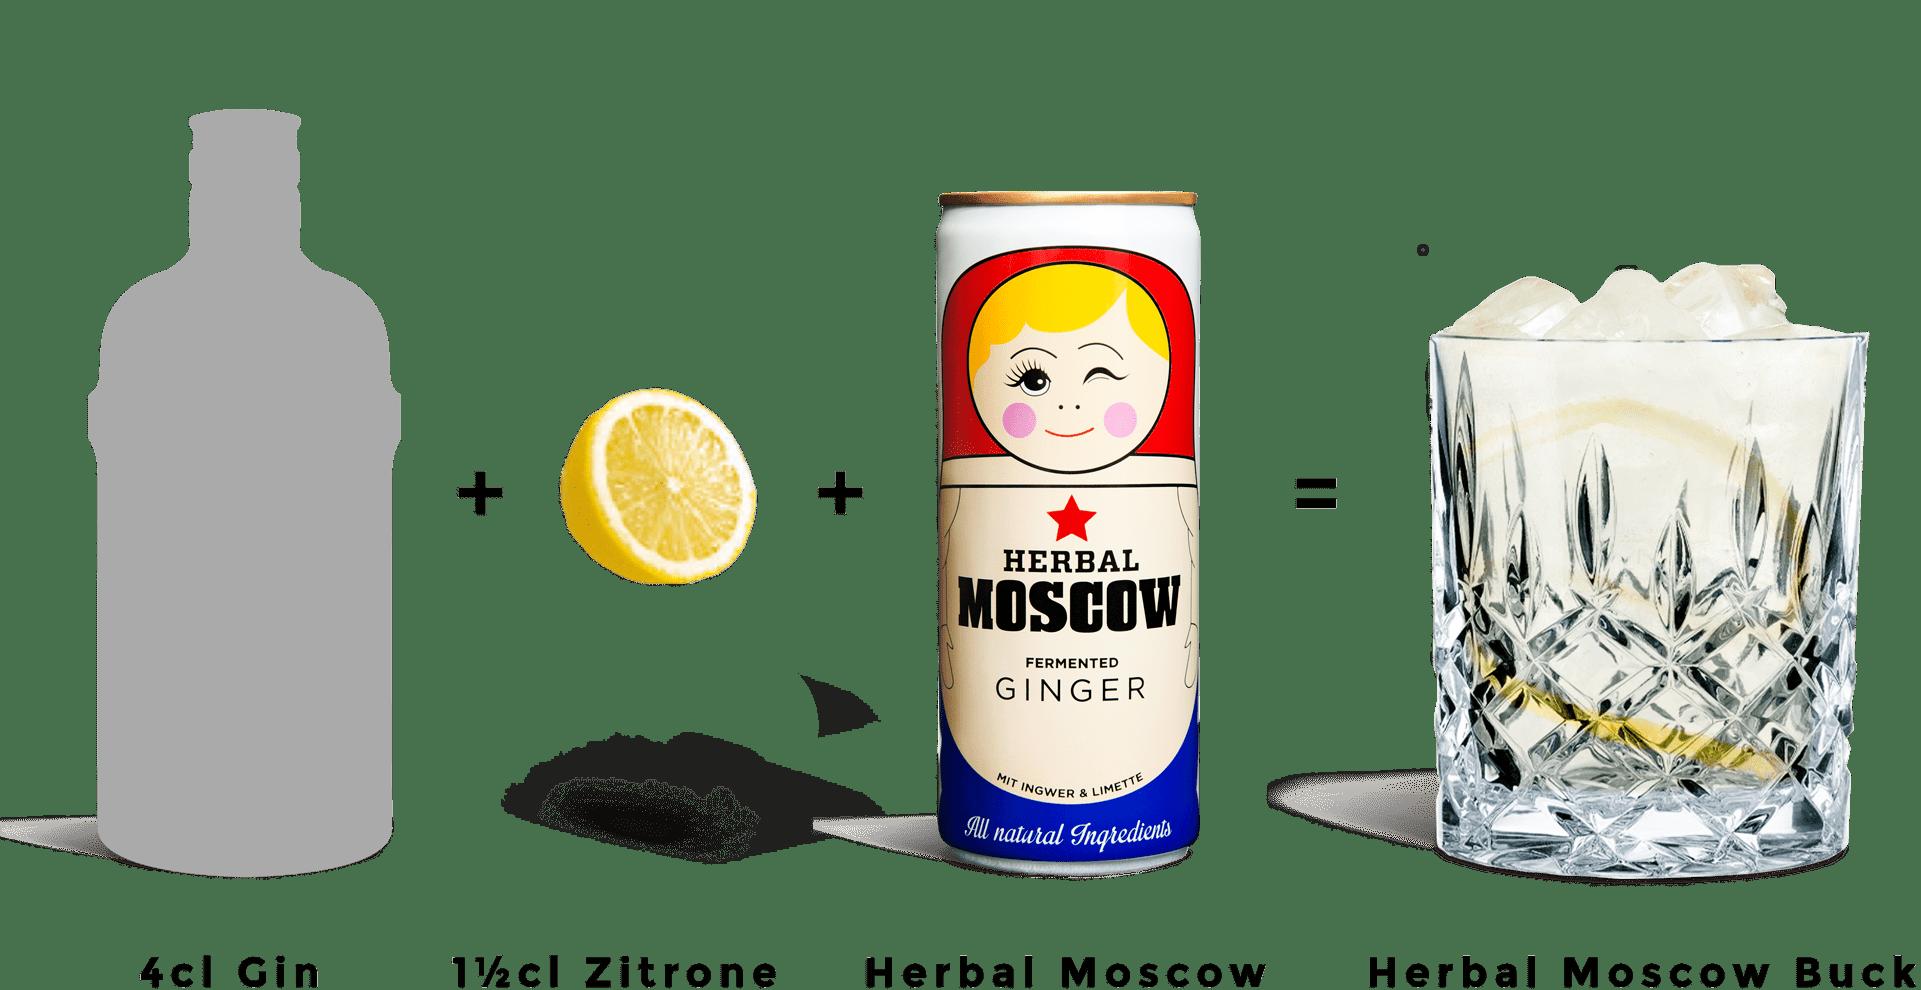 Herbal Moscow Buck Brand Garage